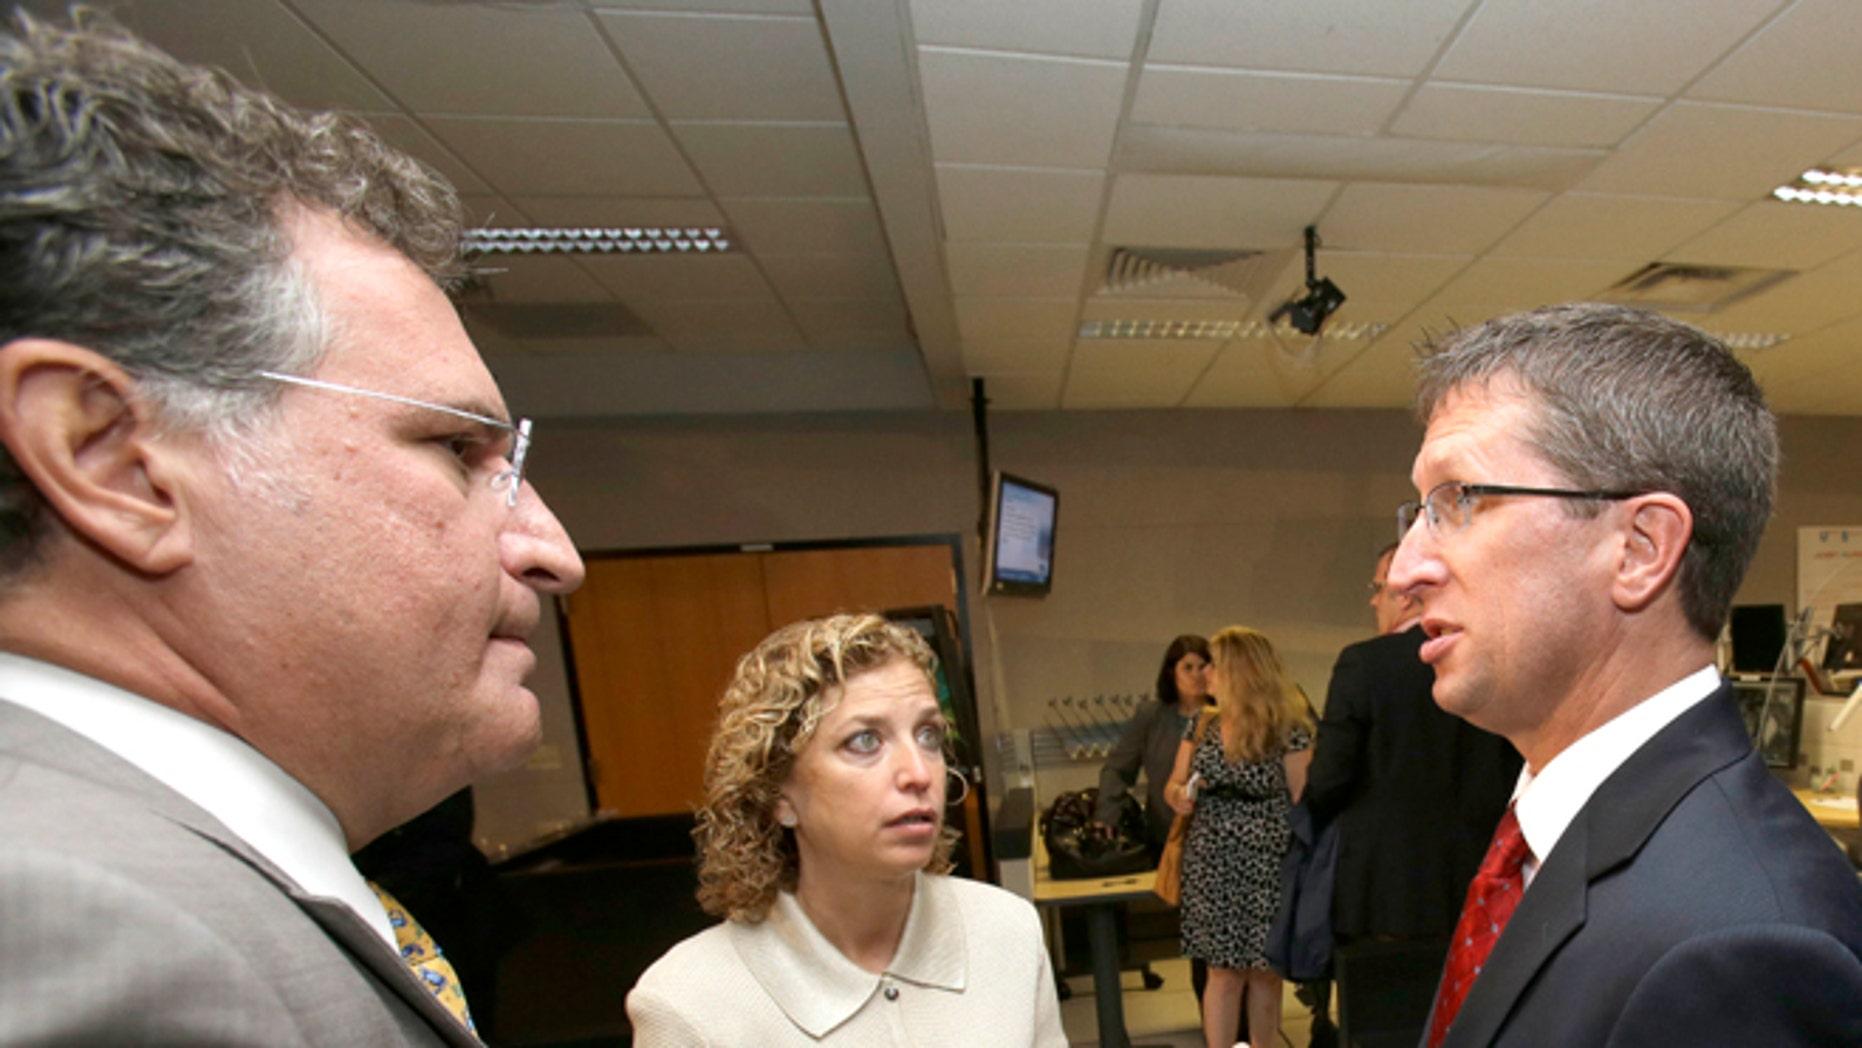 FILE: May 31, 2013: Rep Joe Garcia, D-Fla., with Rick Knabb, National Hurricane Center director, and Rep. Debbie Wasserman Schultz, D-Fla., at the National Hurricane Center in Miami, Fla.